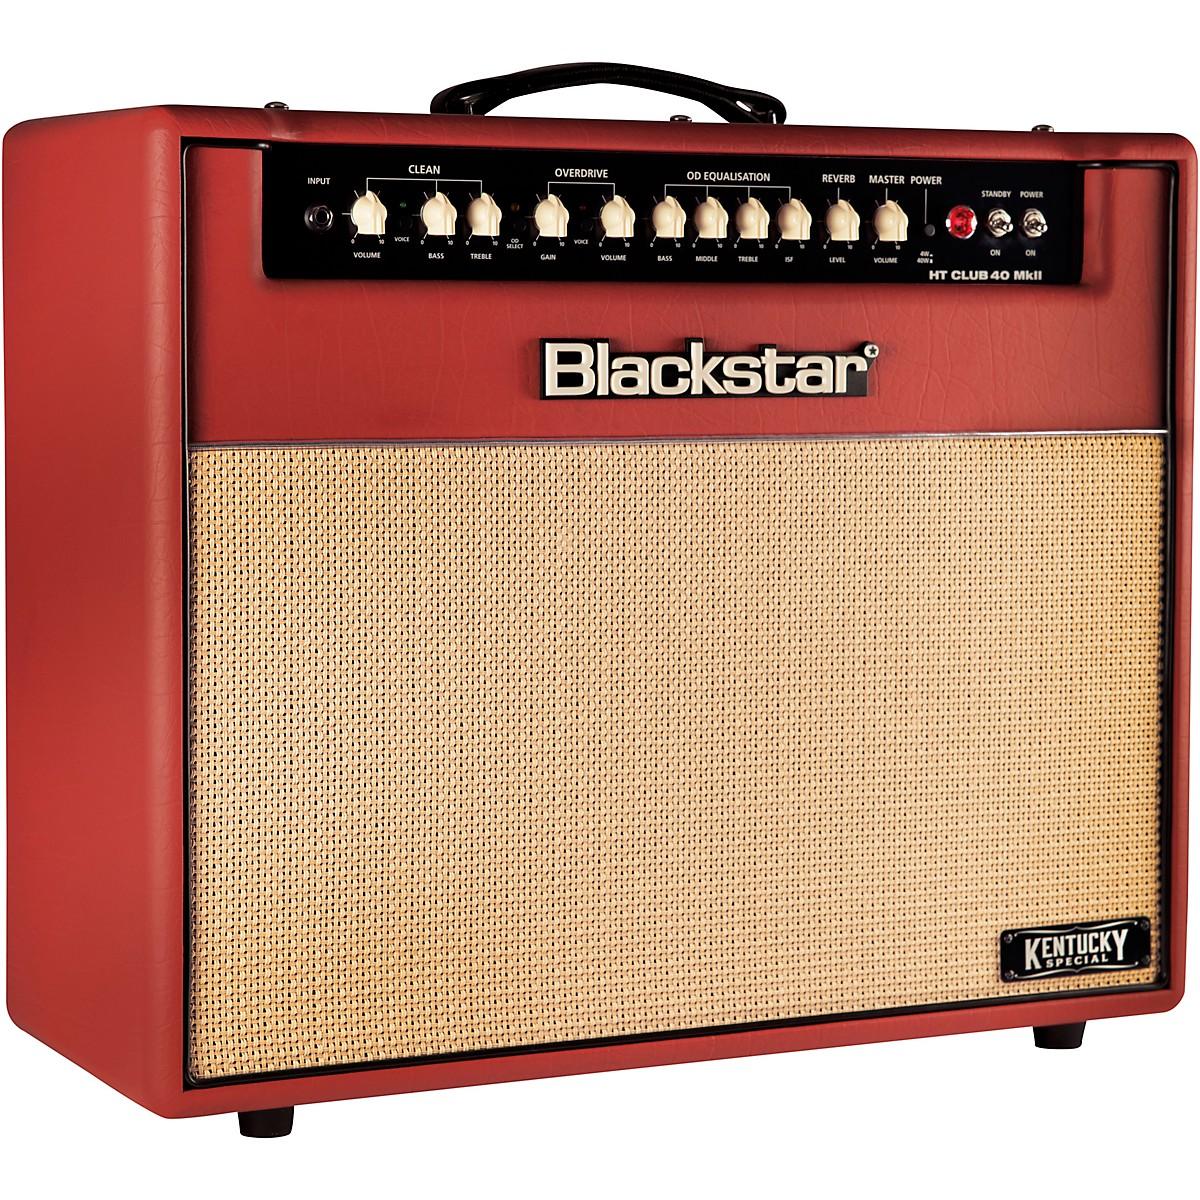 Blackstar CLUB40CMKII Limited Edition Kentucky Special 40W 1x12 Tube Guitar Combo Amp